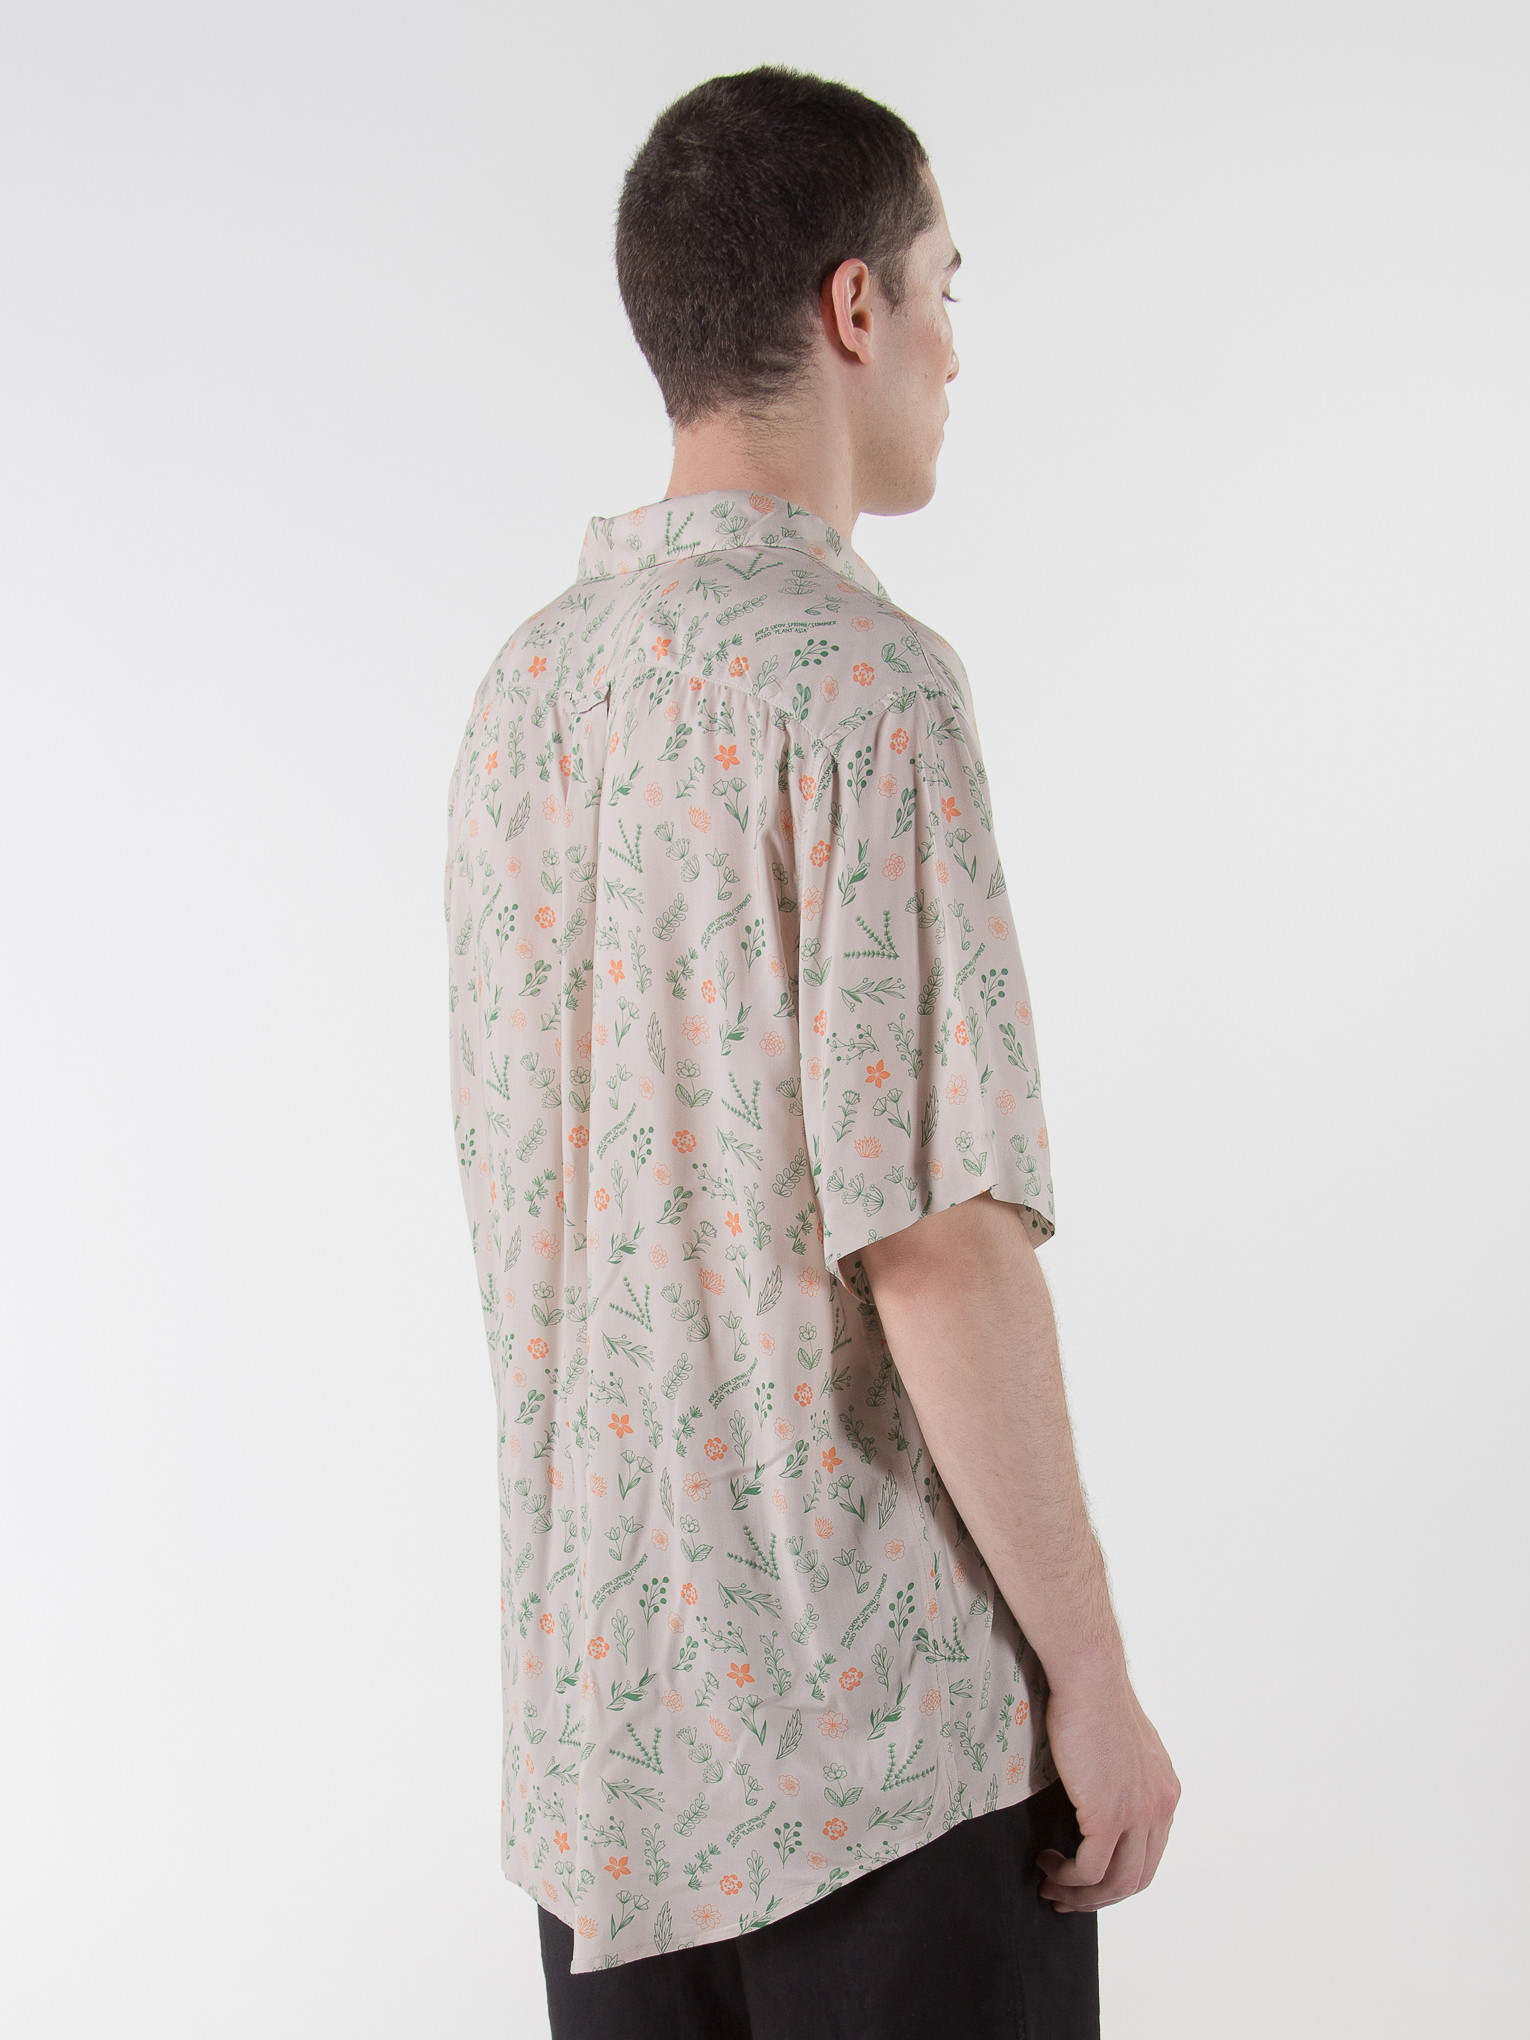 09_rold_skov_ss20_plantasia_shirt-09.jpg